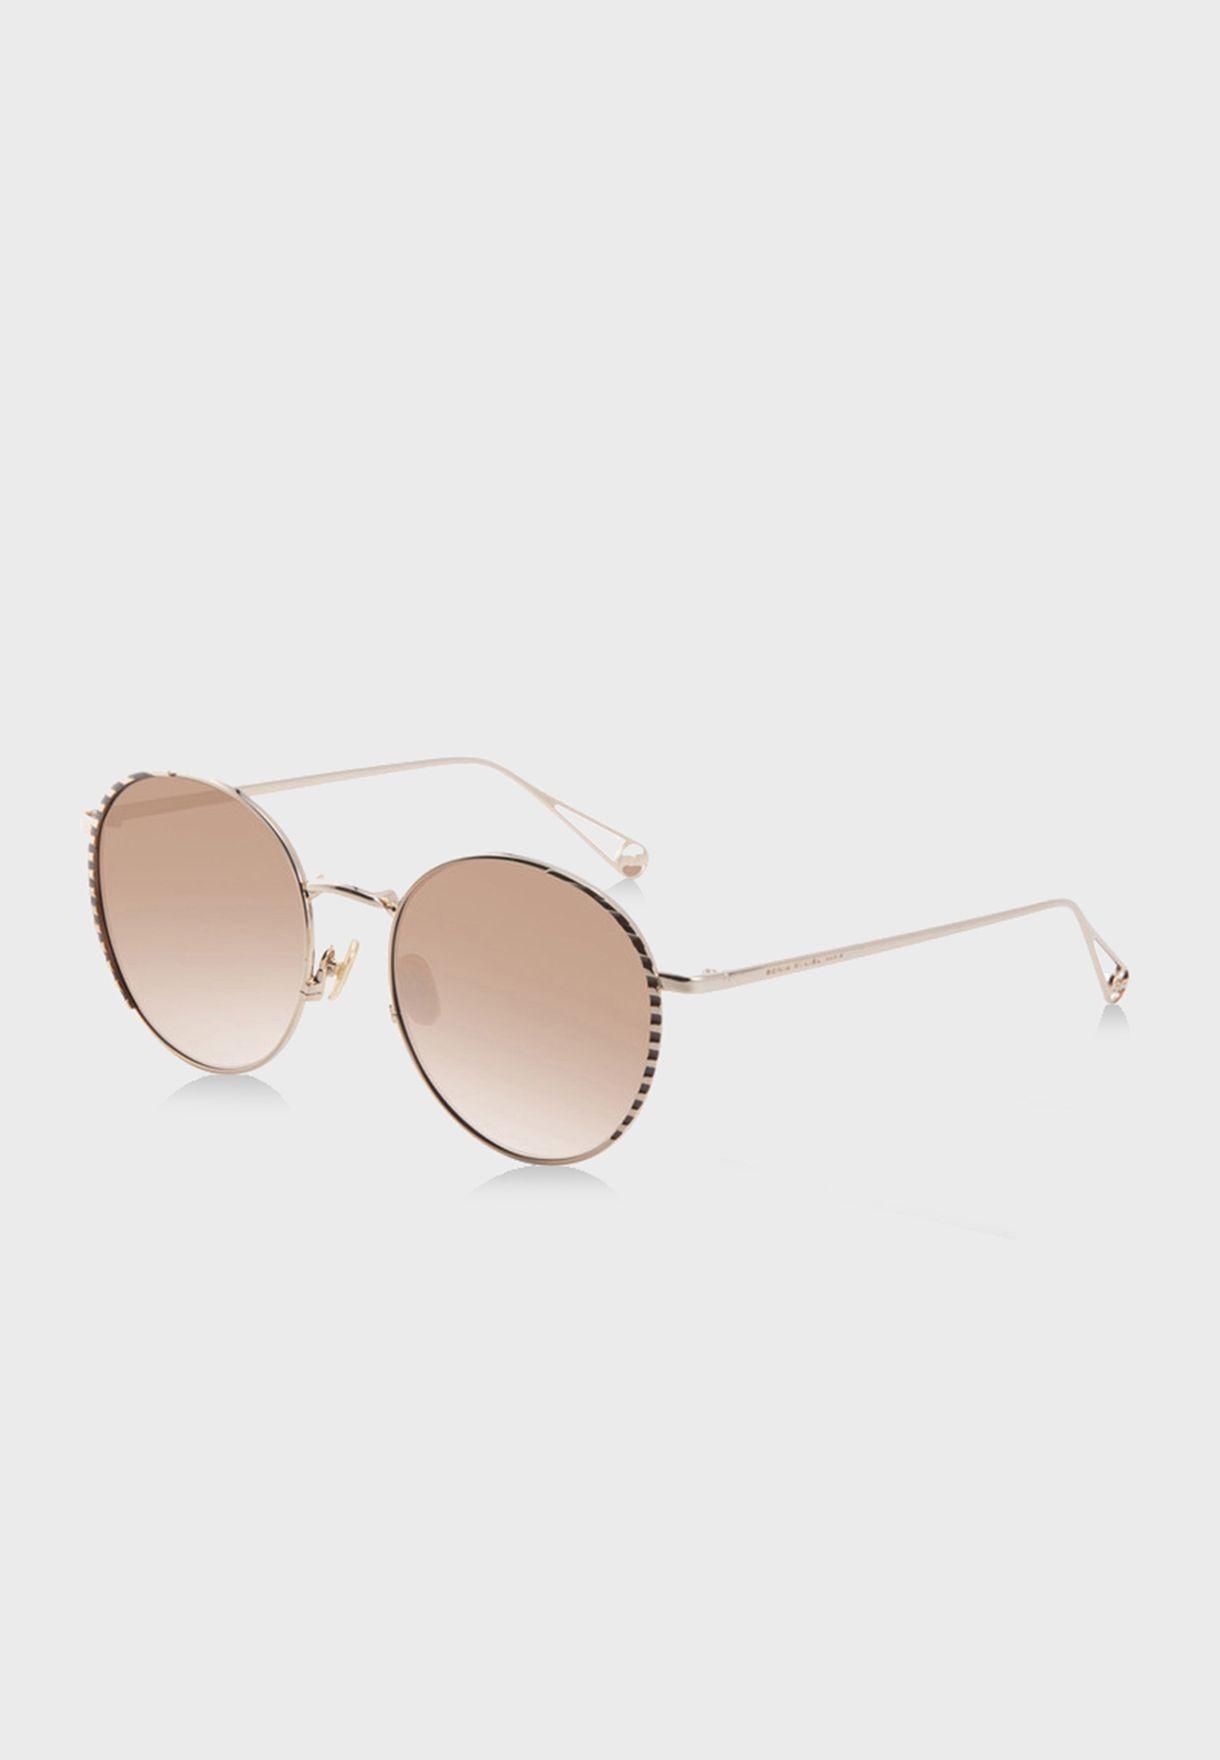 L SR778701 Oversized Sunglasses